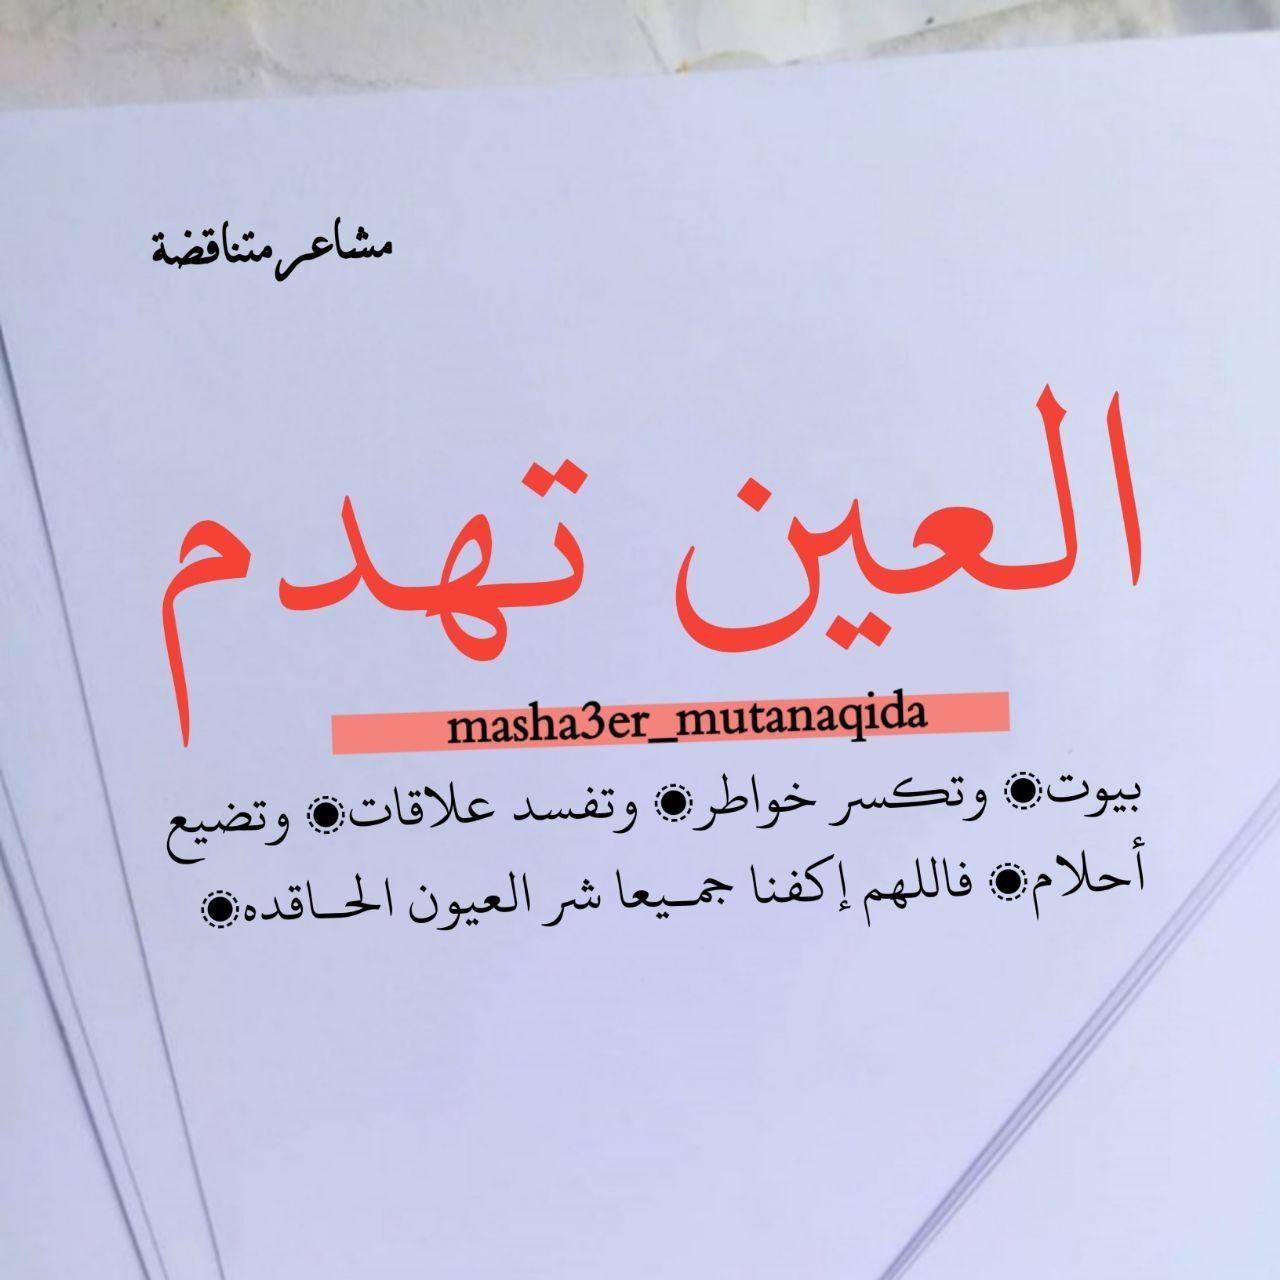 العين تهدم بيوت Arabic Calligraphy Calligraphy